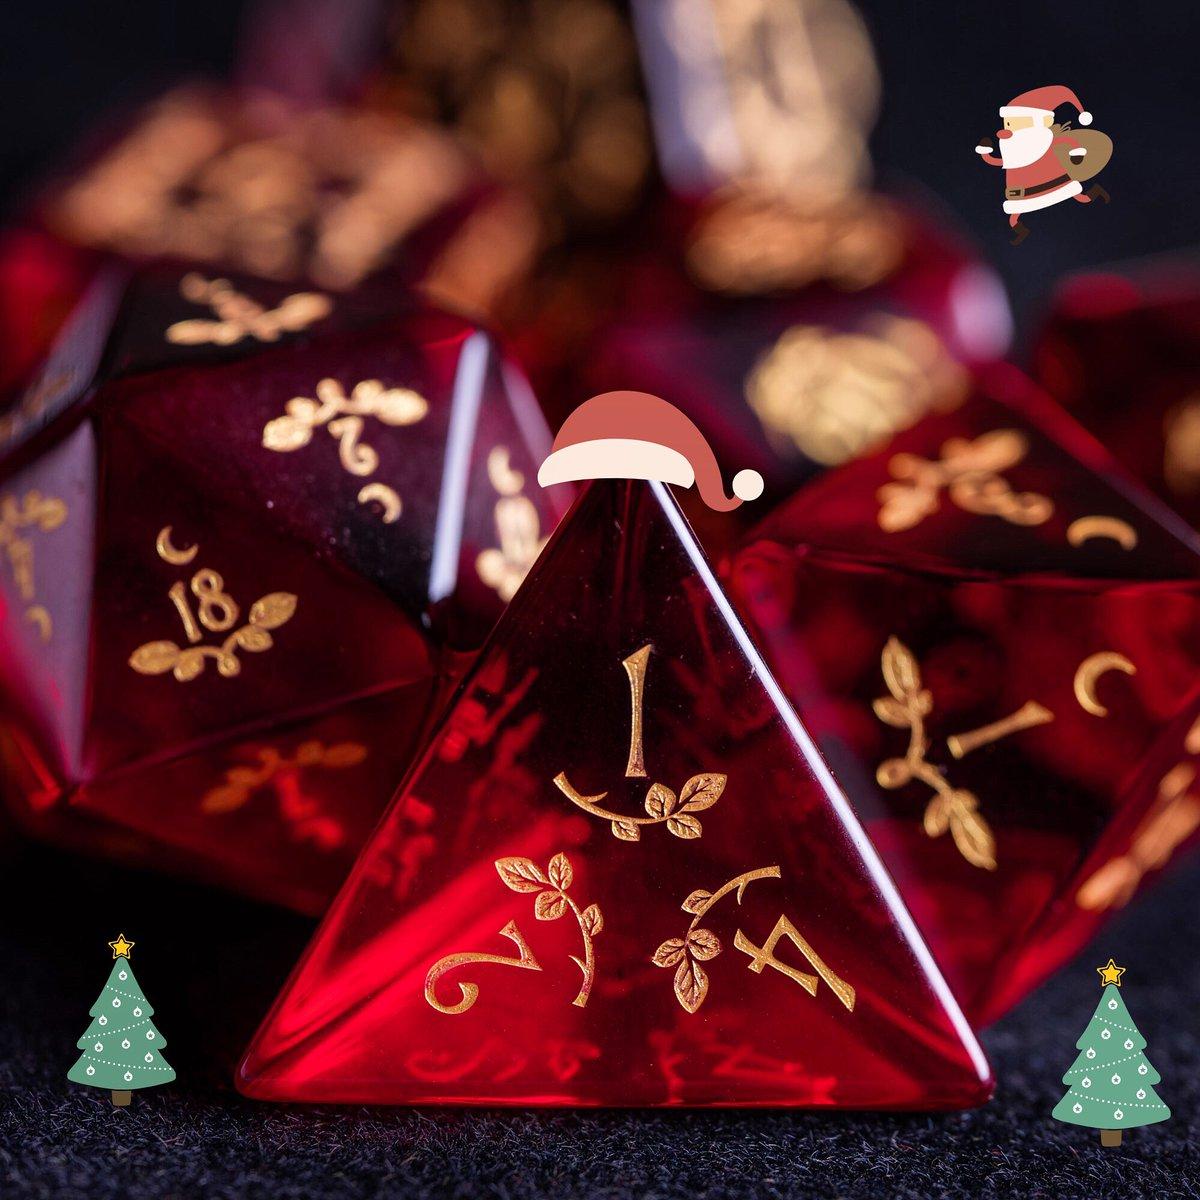 Merry Christmas, my friends🎅🏻❤️ #dnd #dice #ttrpg #dungeonsanddragons